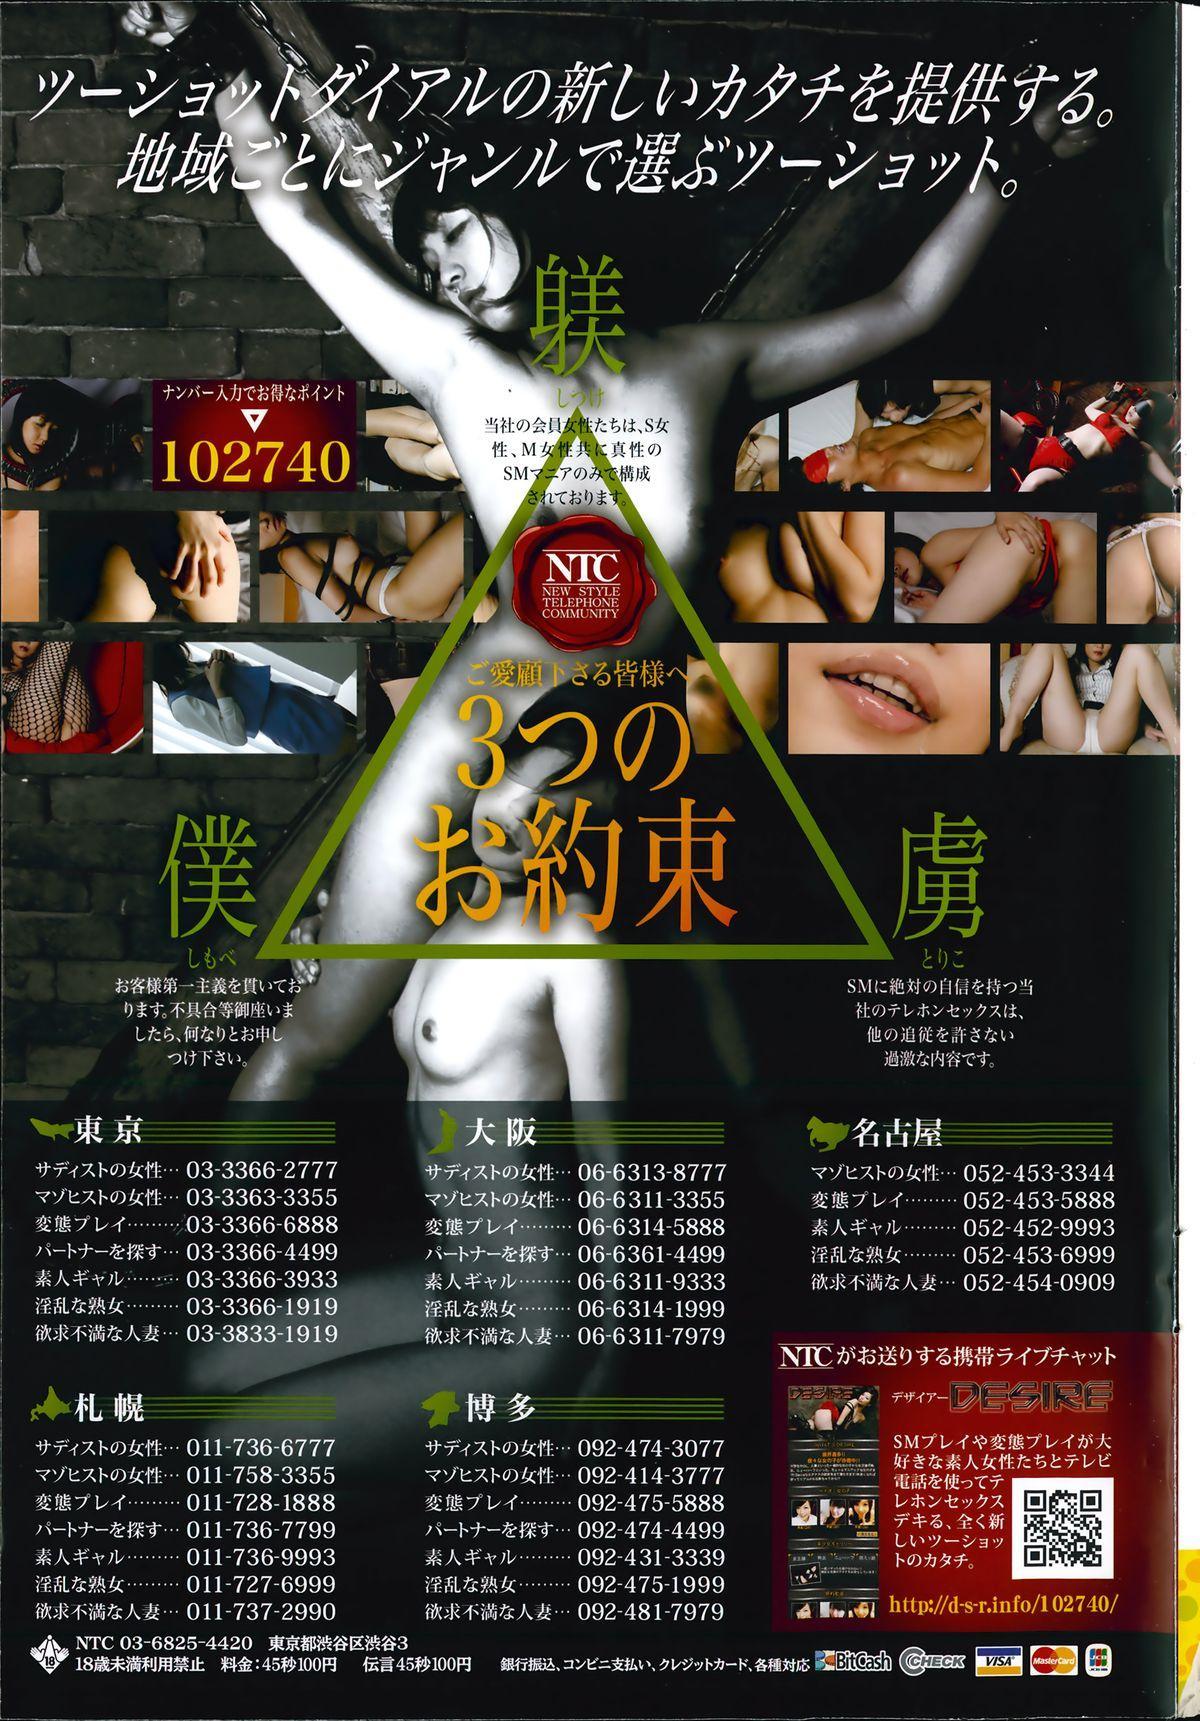 COMIC Penguin Club Sanzokuban 2014-06 242